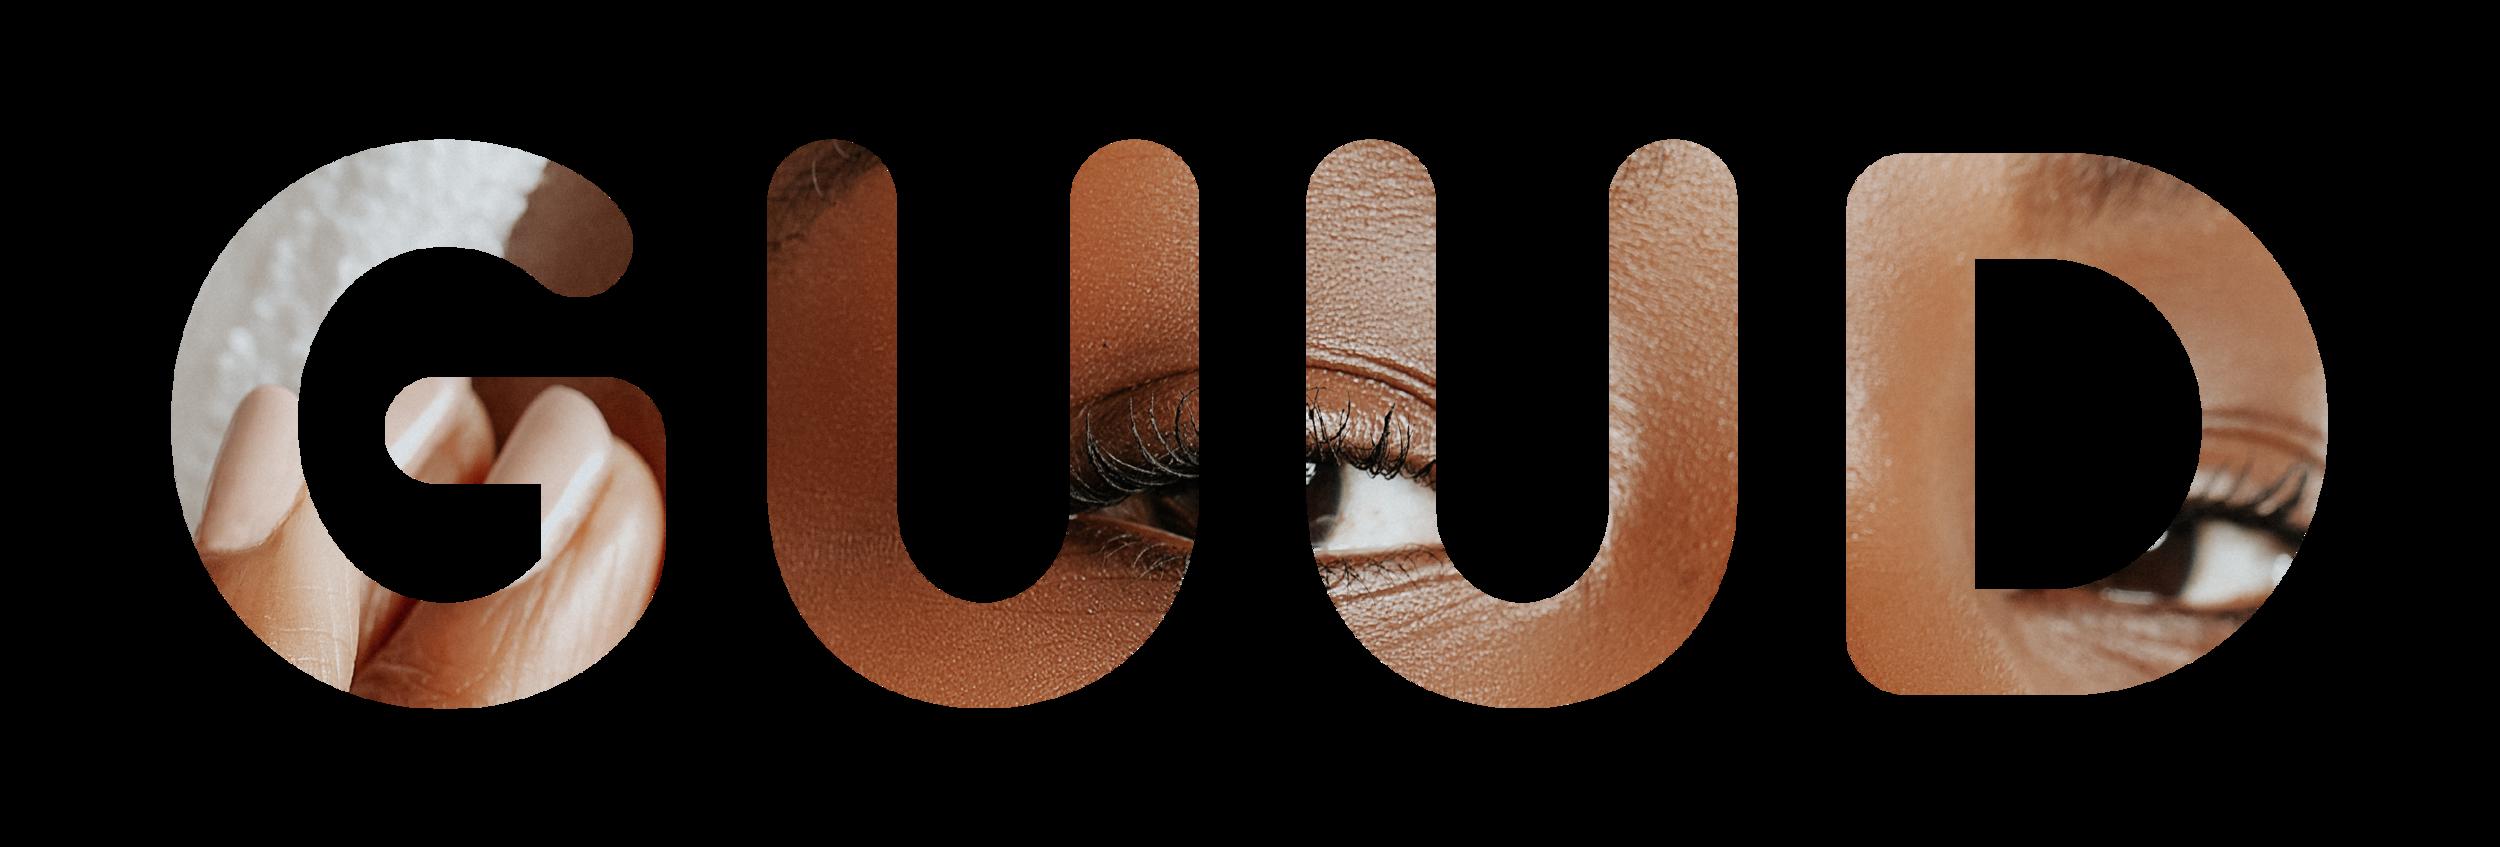 Logo Image_Tekengebied 1.png